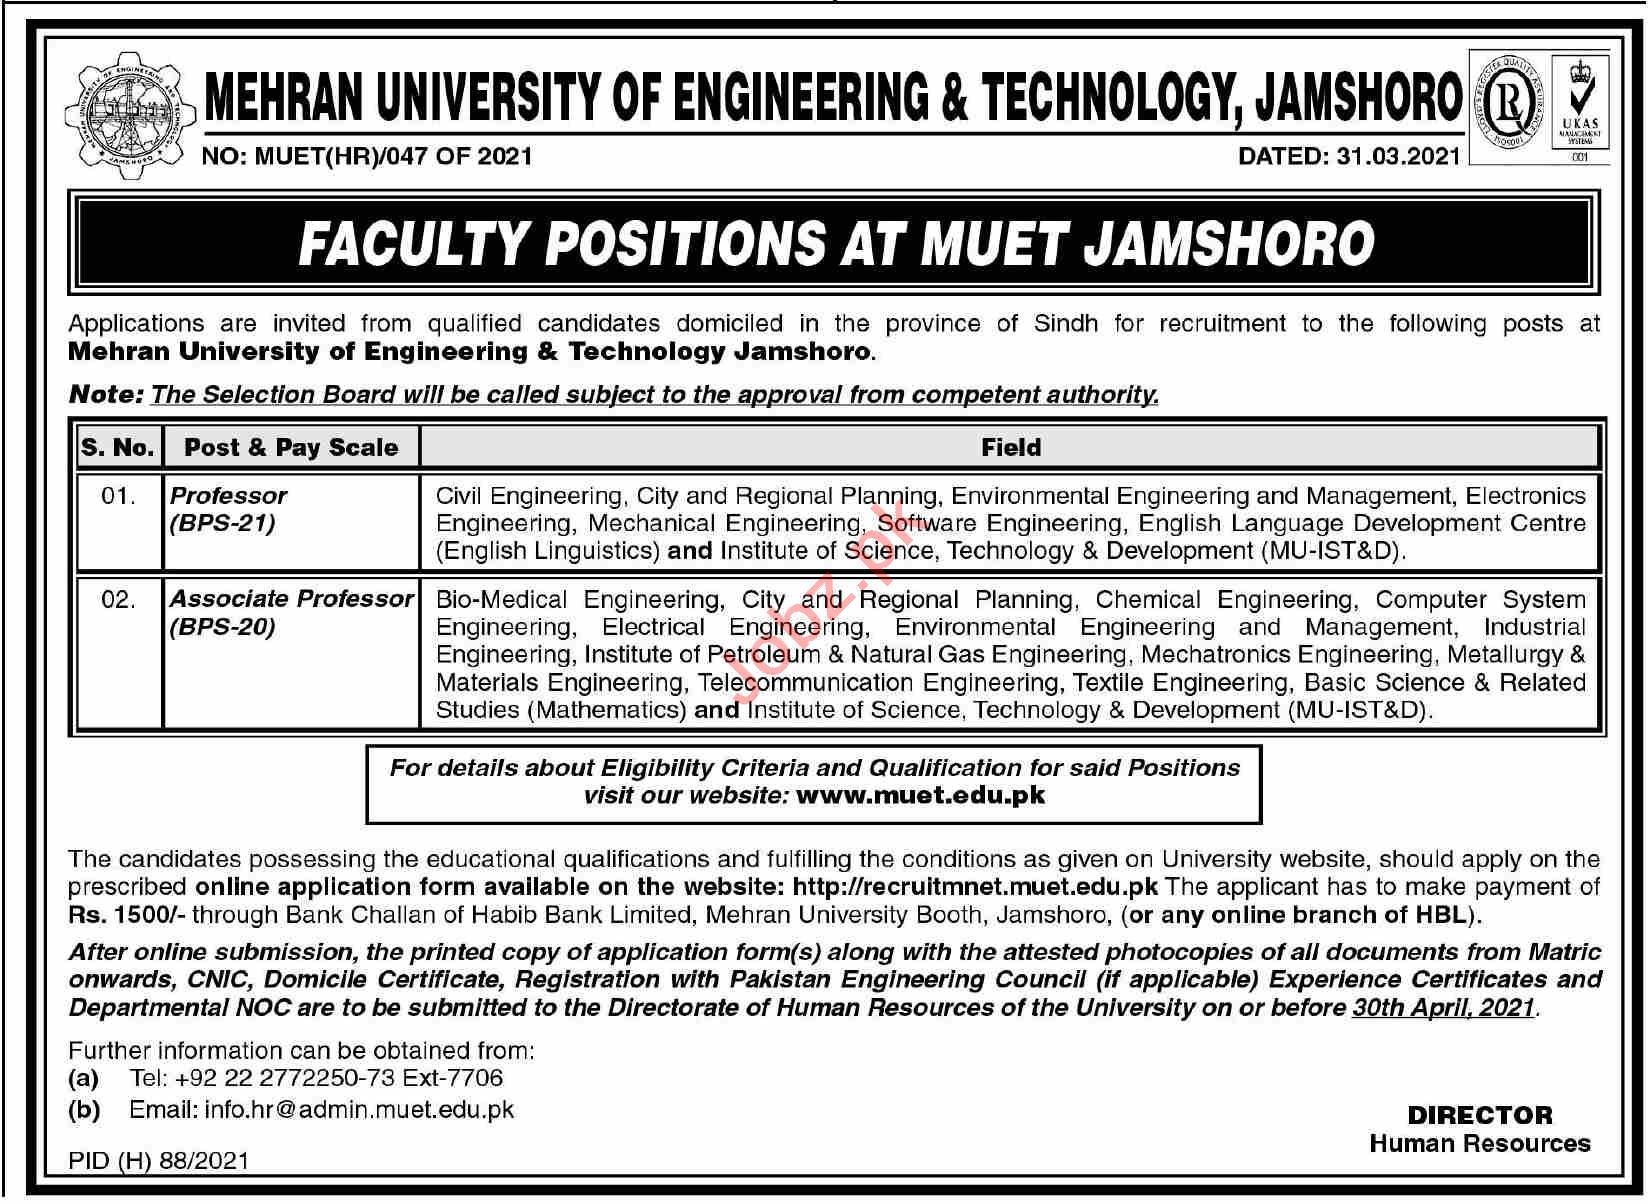 Mehran University of Engineering & Technology MUET Jobs 2021